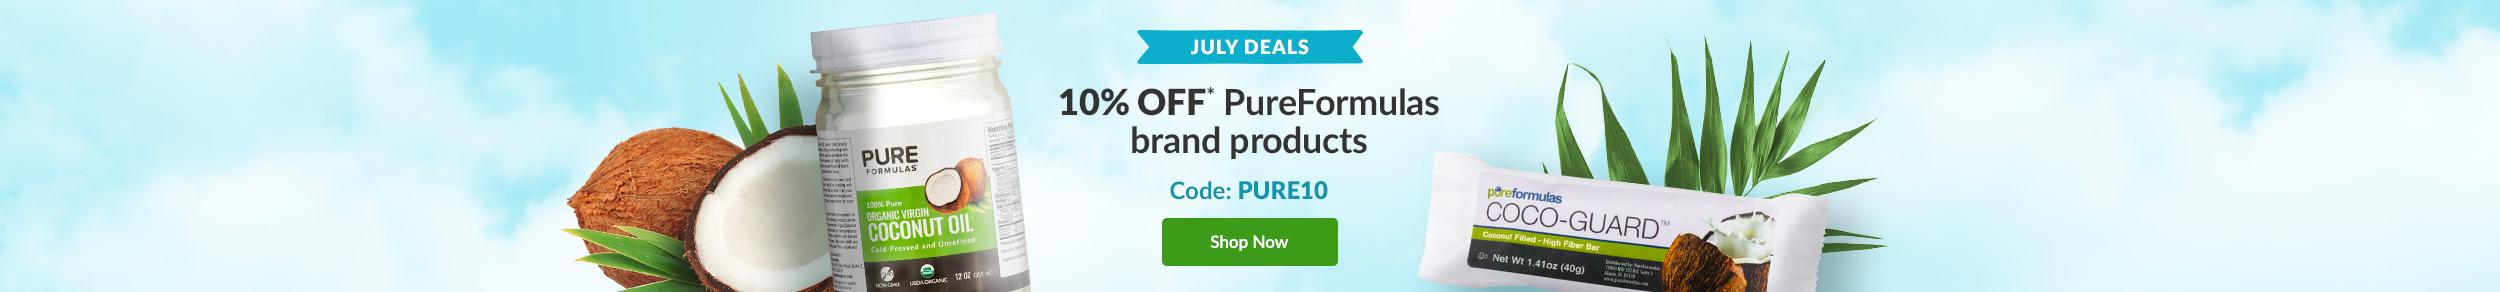 https://i3.pureformulas.net/images/static/PureFormulas_Food_Store_062819.jpg